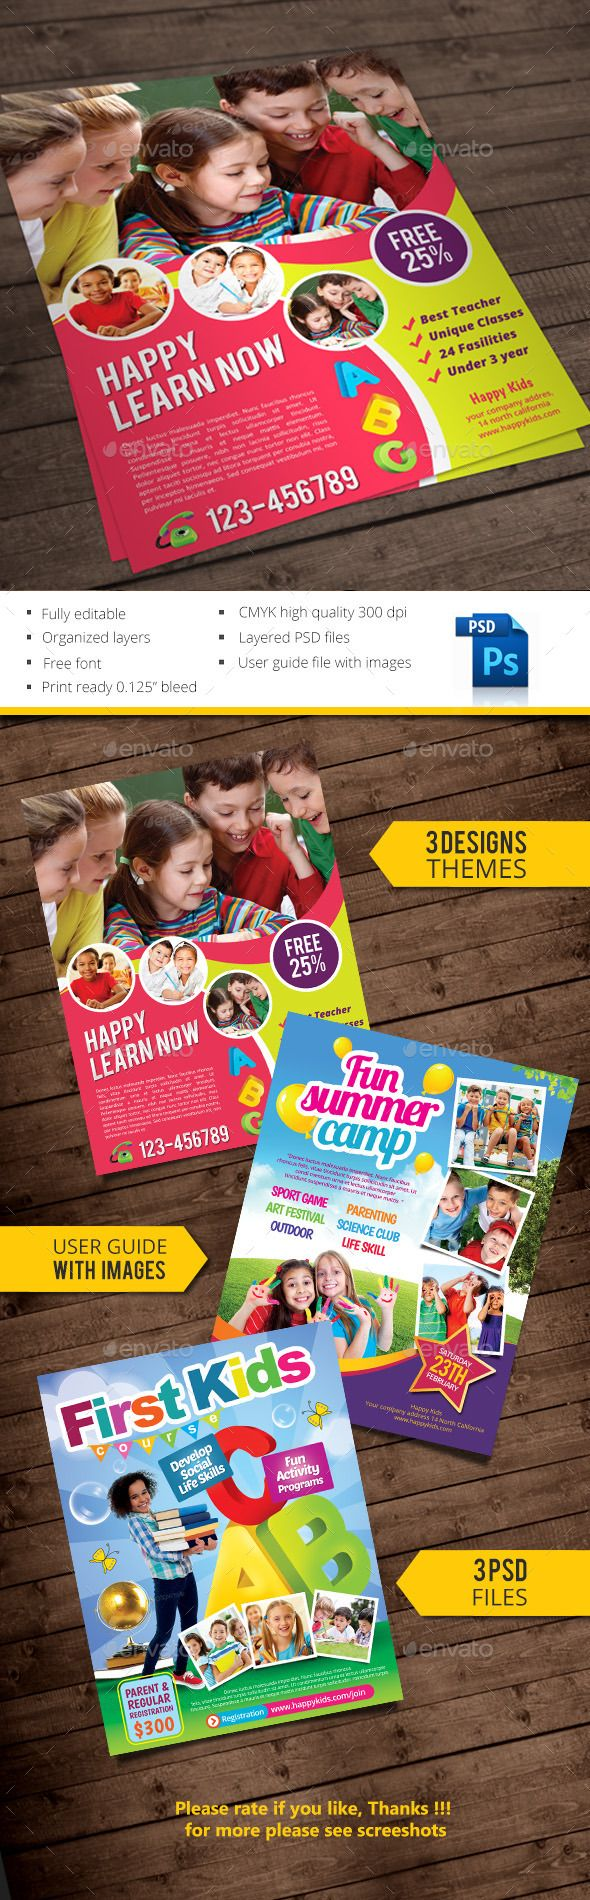 Kids. Fully editable promotional flyer template. #children #education #festival #flyer #game #HomeSchooling #kids #kindergarten #outdoor #play #playground #school #student #teacher